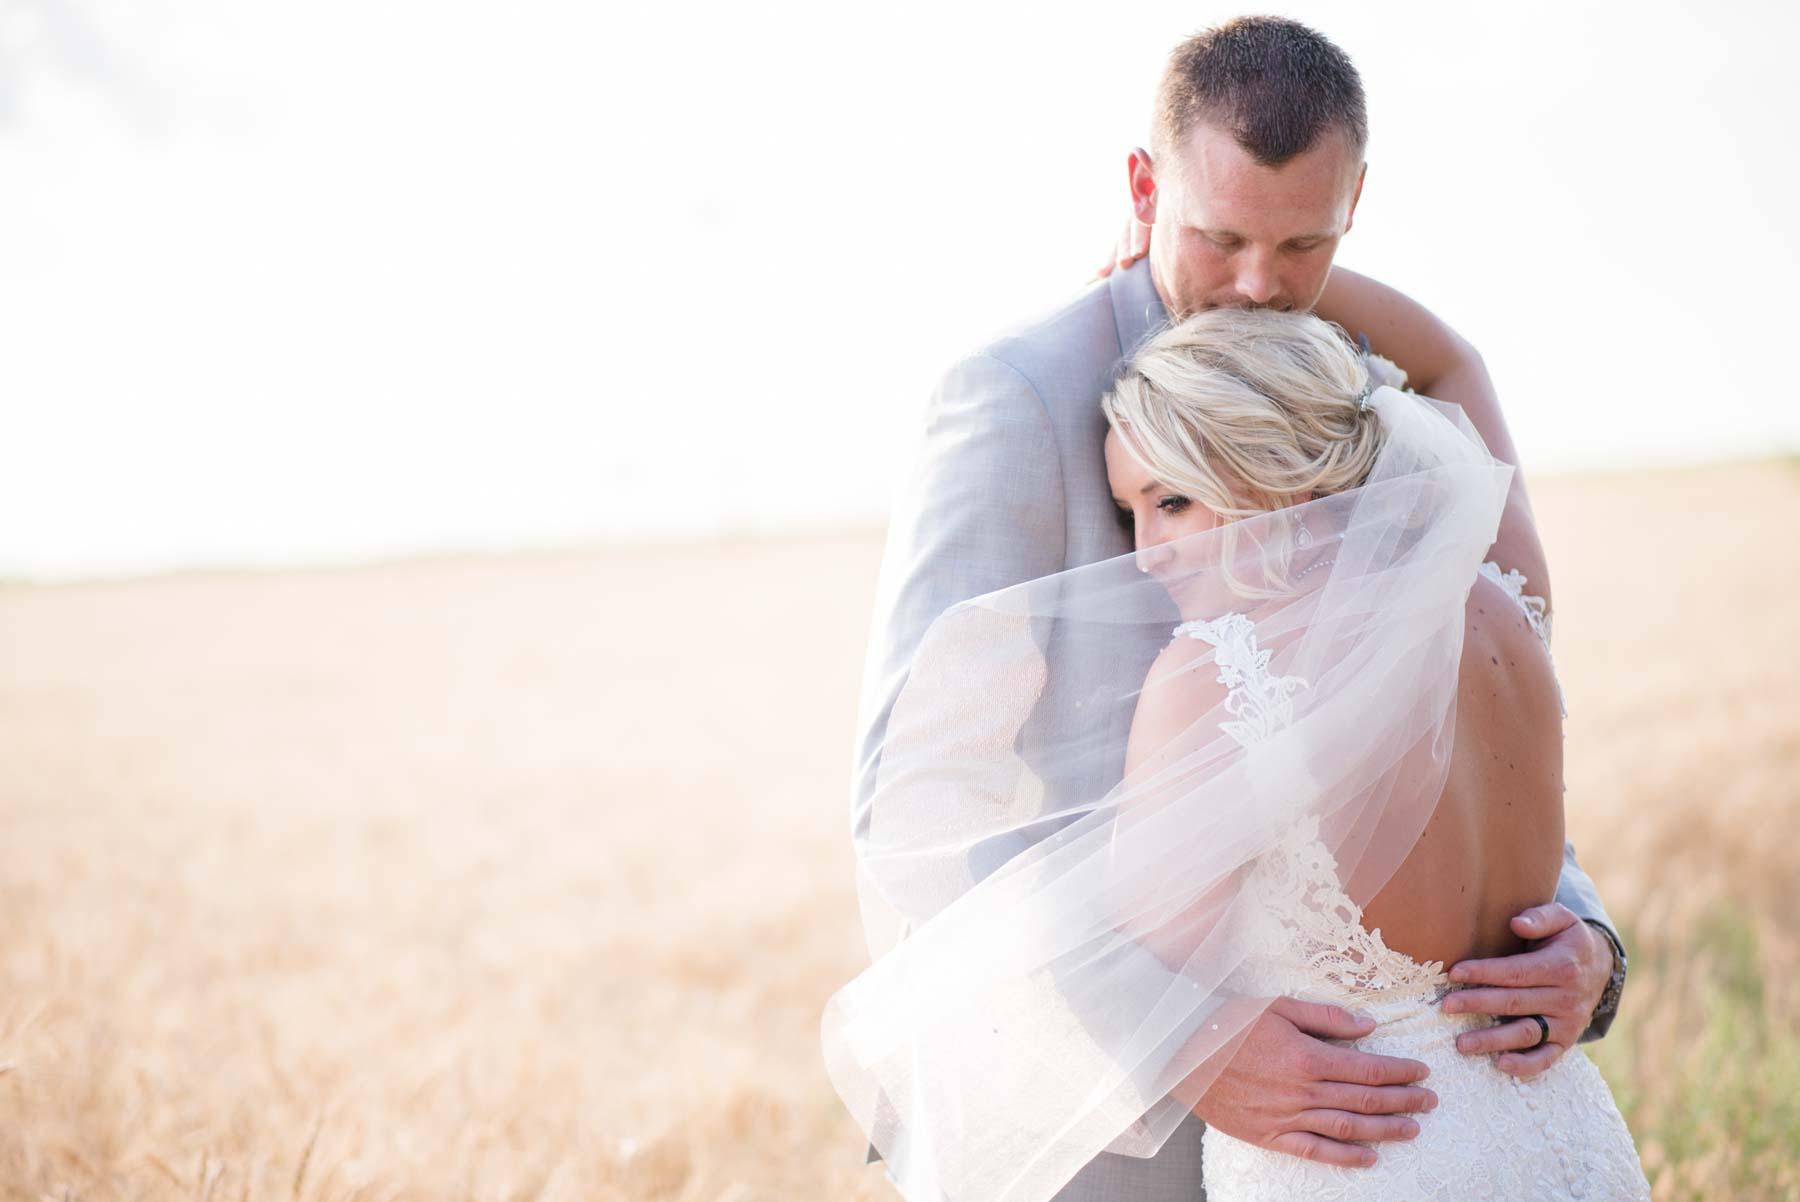 Fort Collins Wedding Photographers | Elizabeth Jane Photography | www.elizabethjanephotography.com | Fort Collins, CO